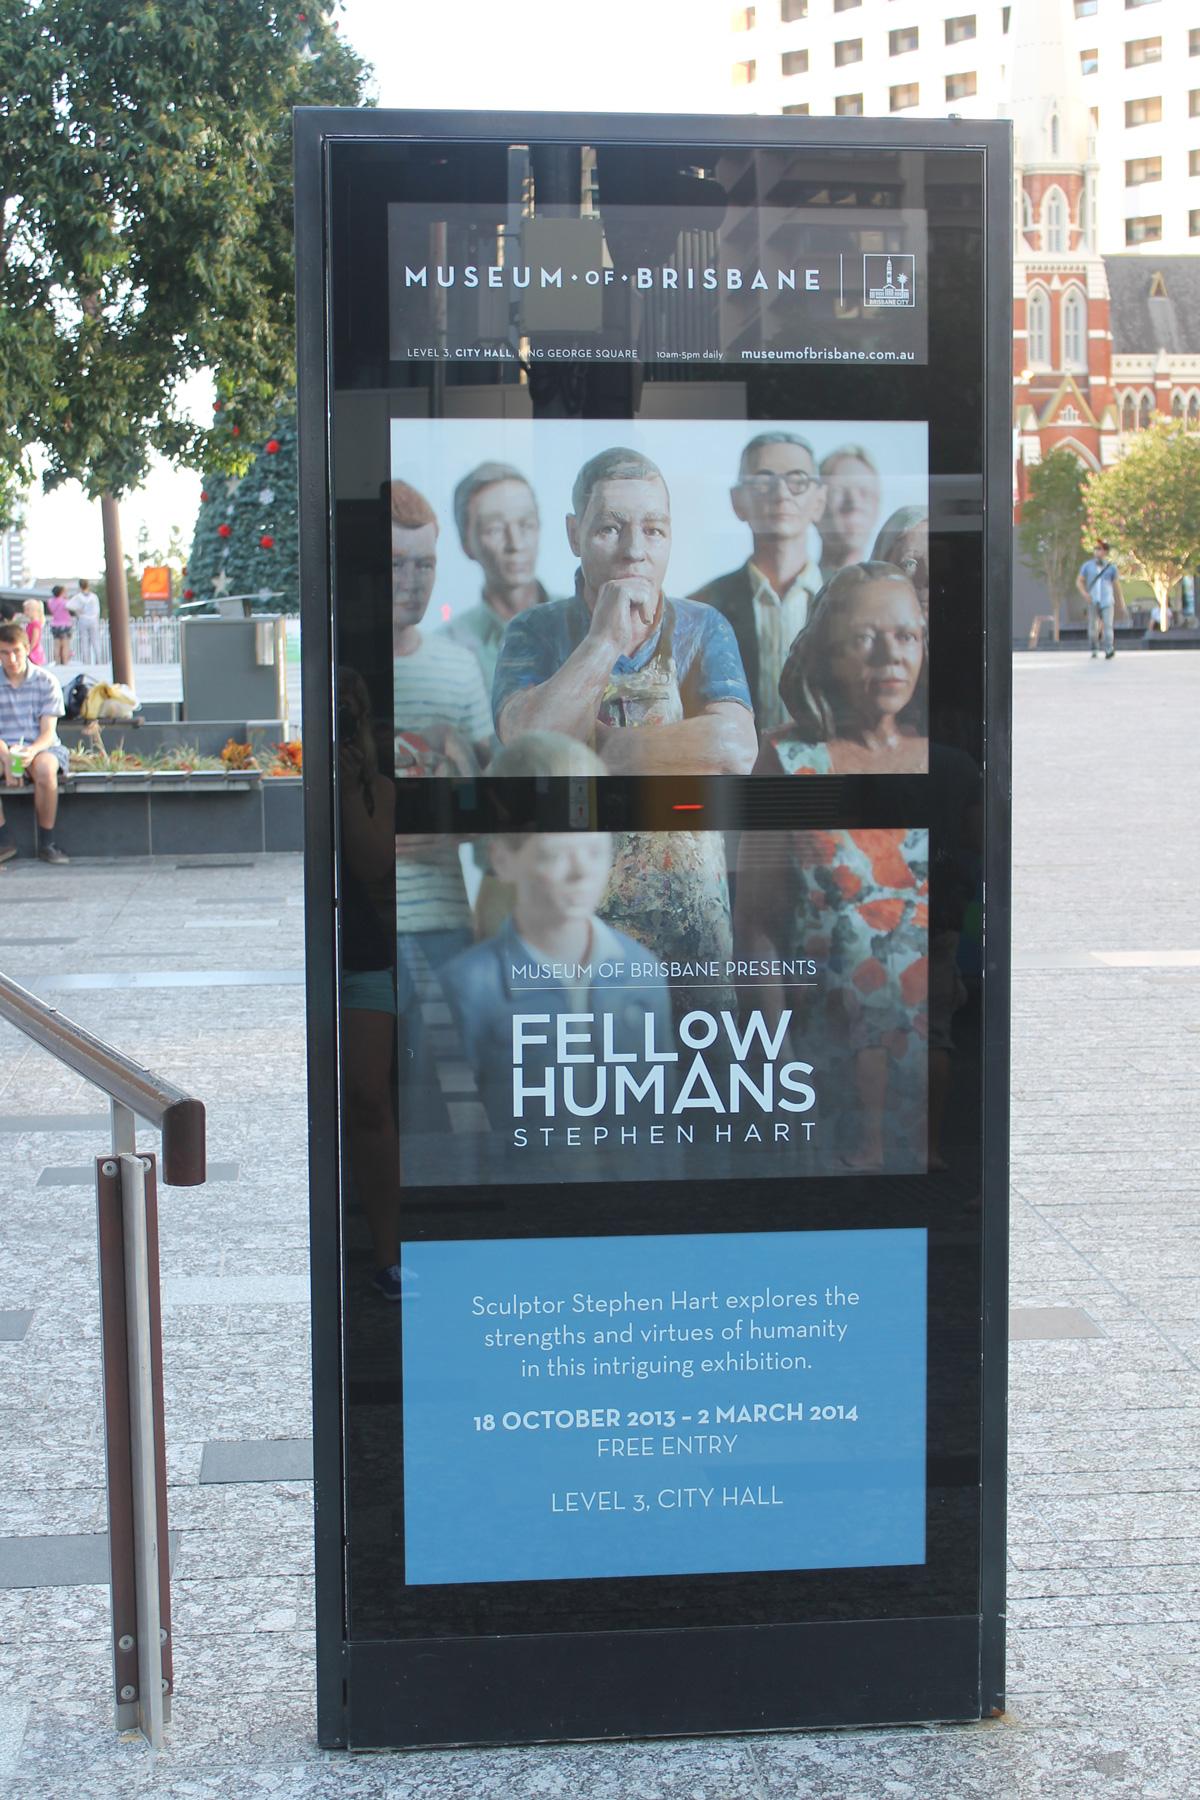 Museum-of-Brisbane_Fellow-Humans_4.jpg